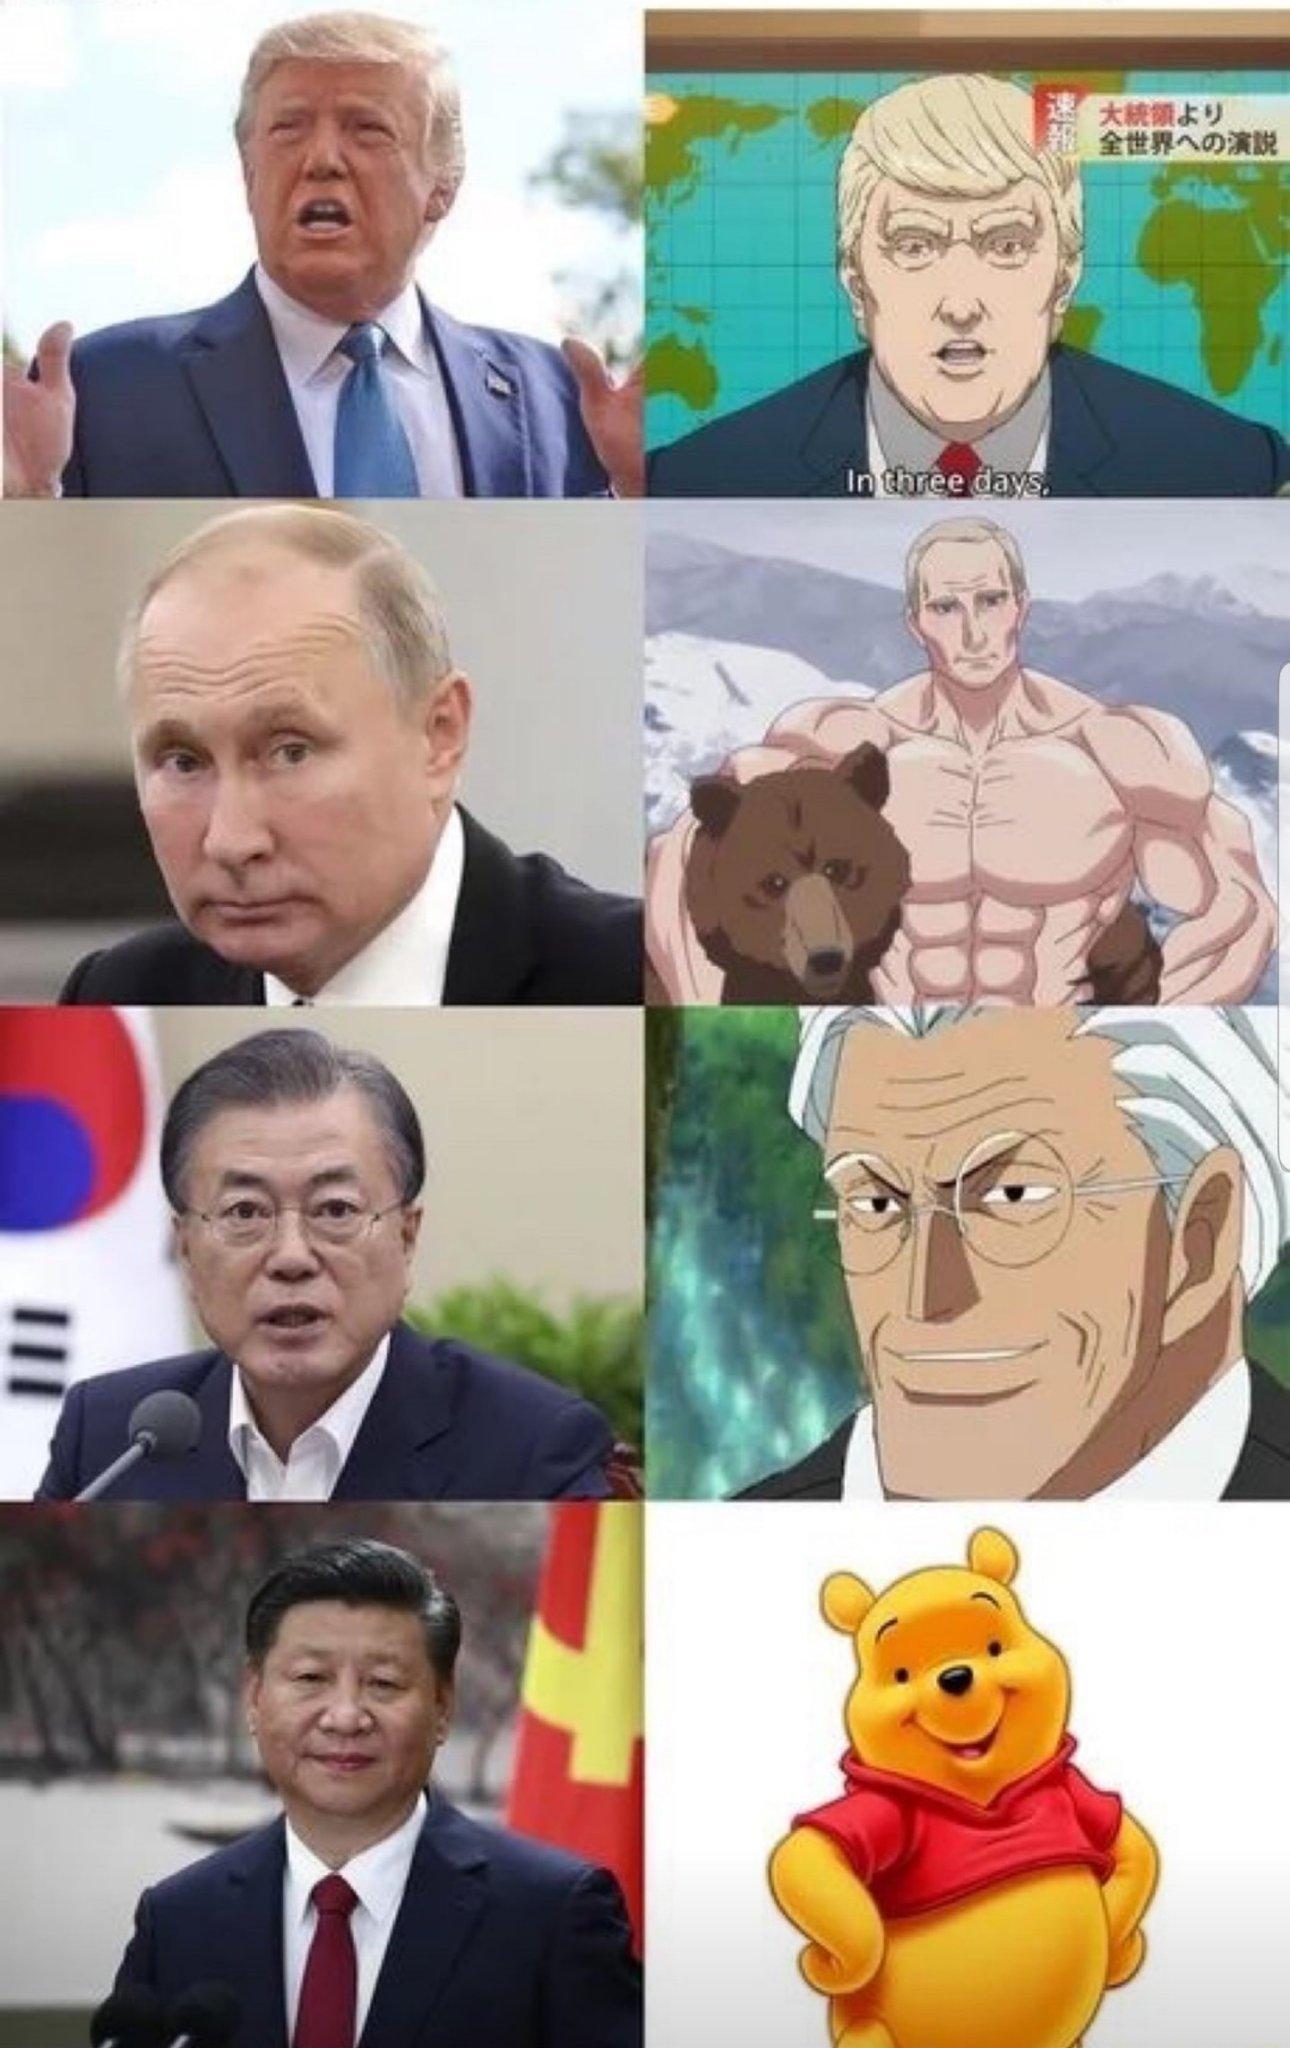 Anime adaptations are spot on - meme